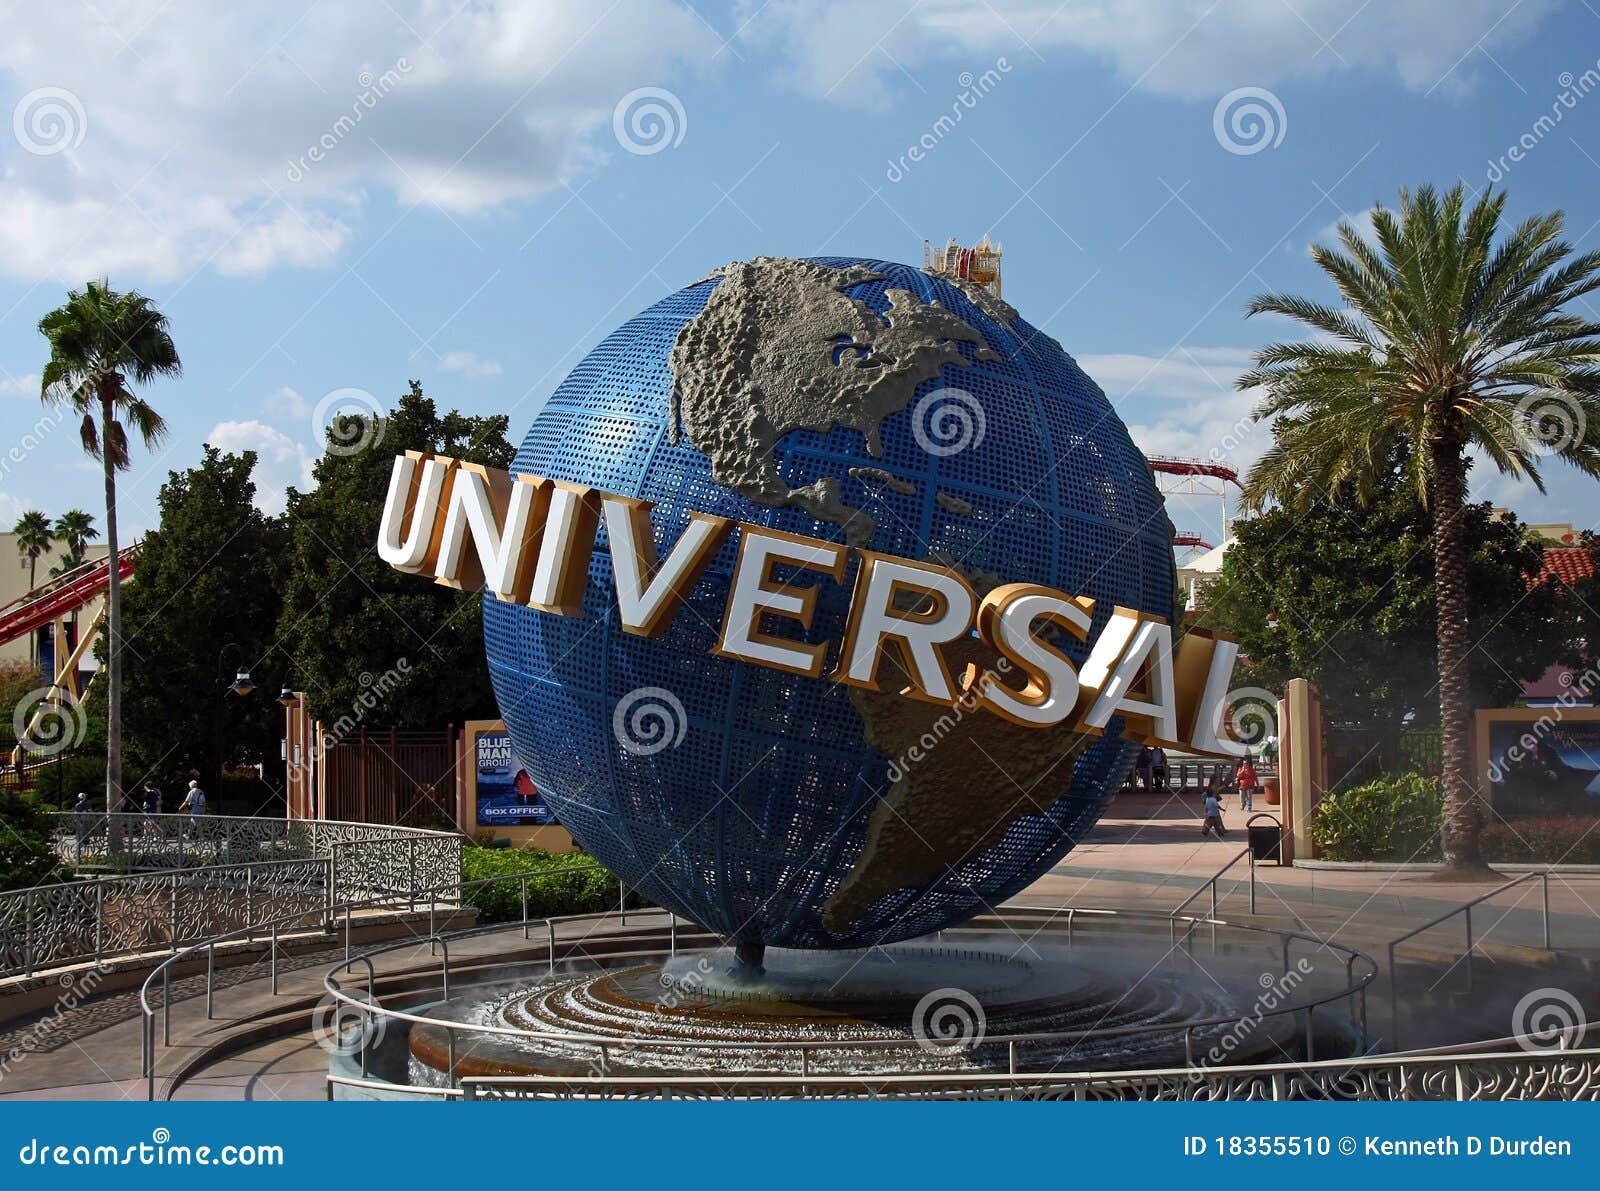 persistent bioaccumulative and toxic chemicals i fate and